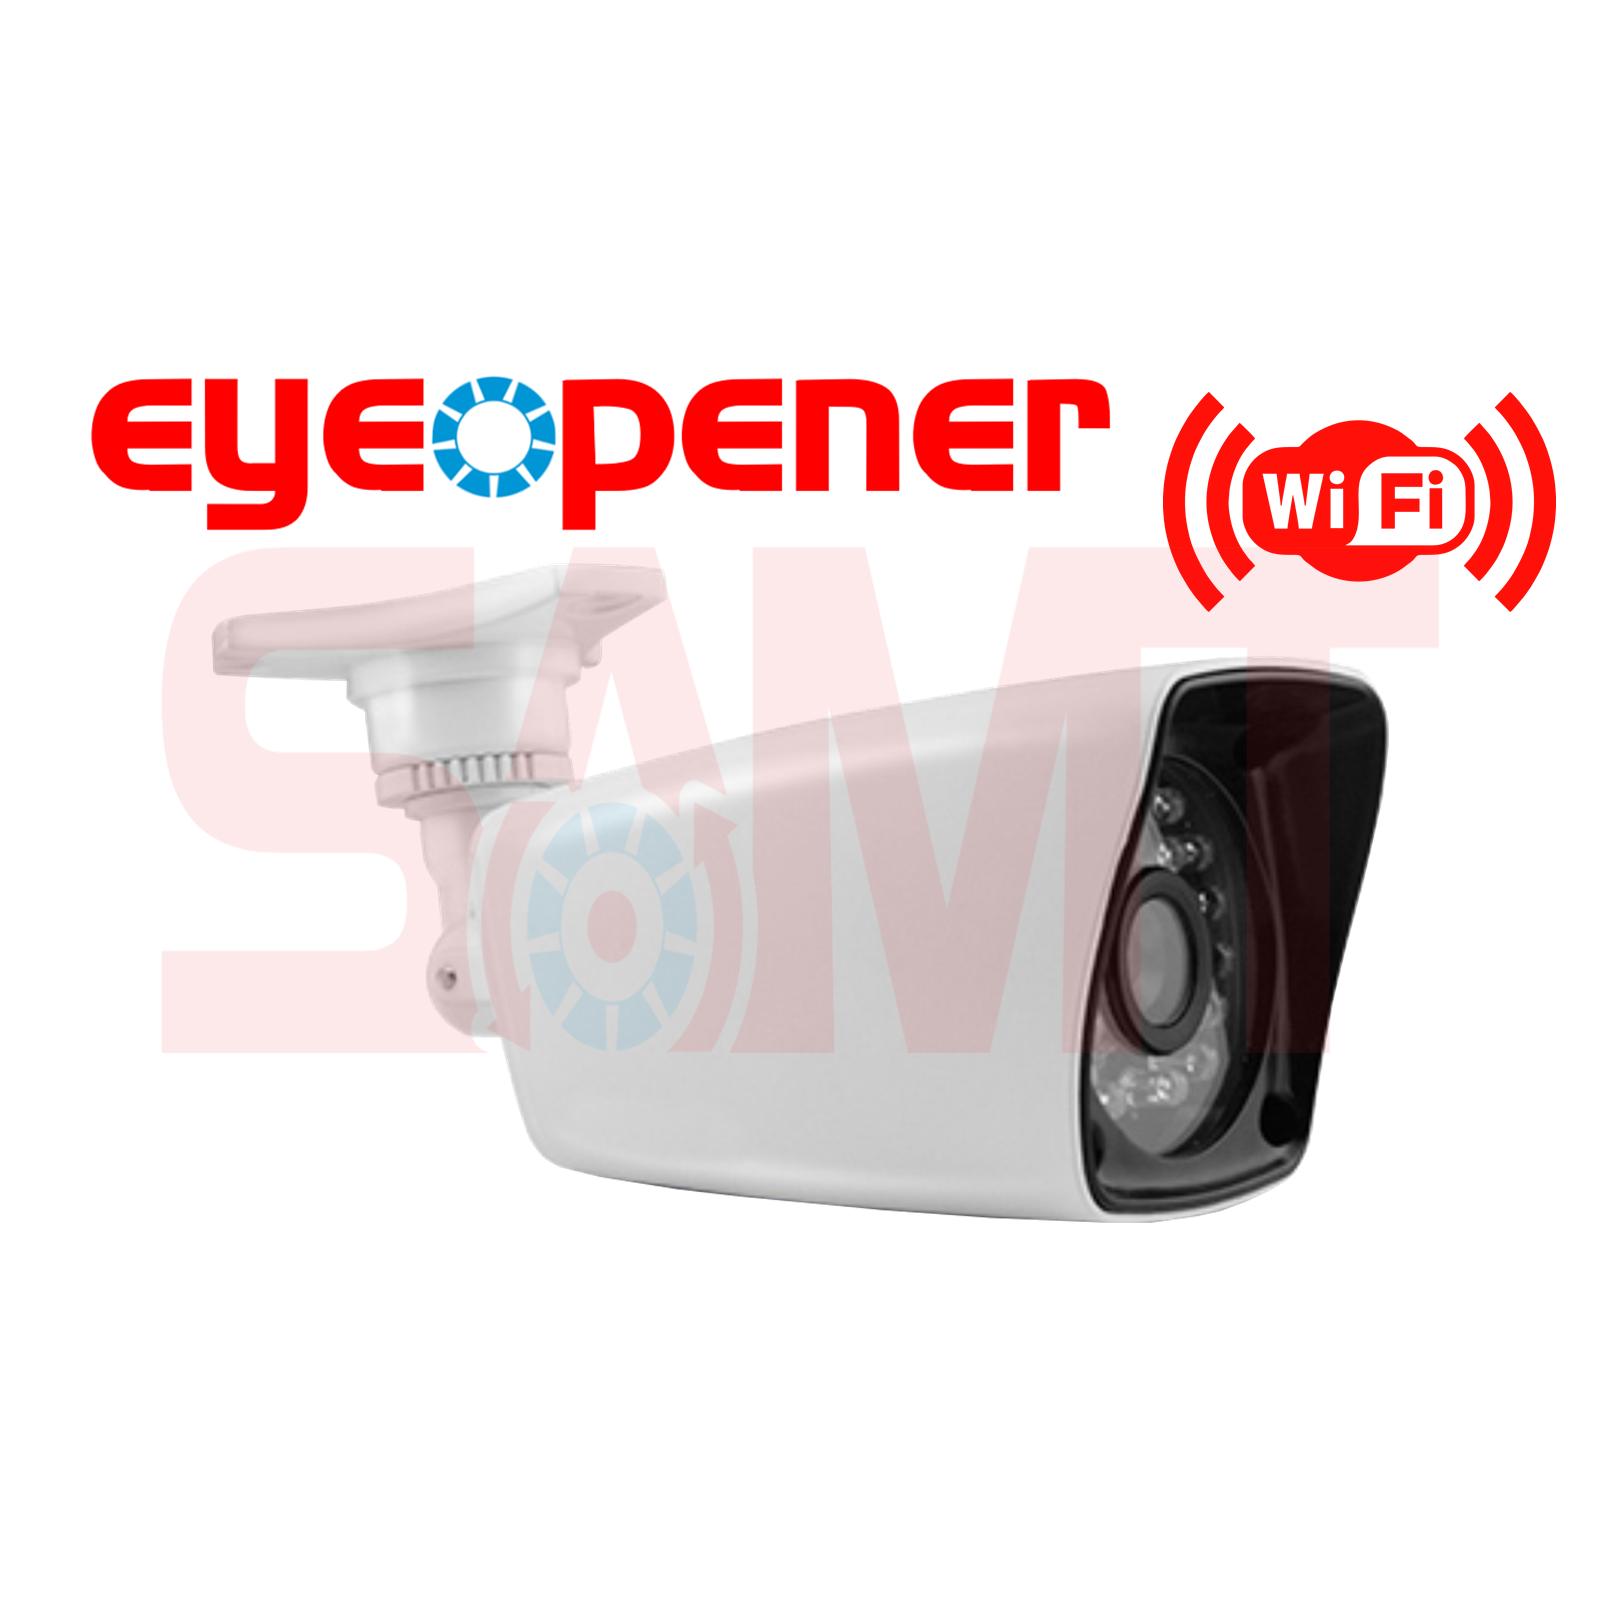 Eyeopener Wi Fi Outdoor Video Surveillance Ip Camera